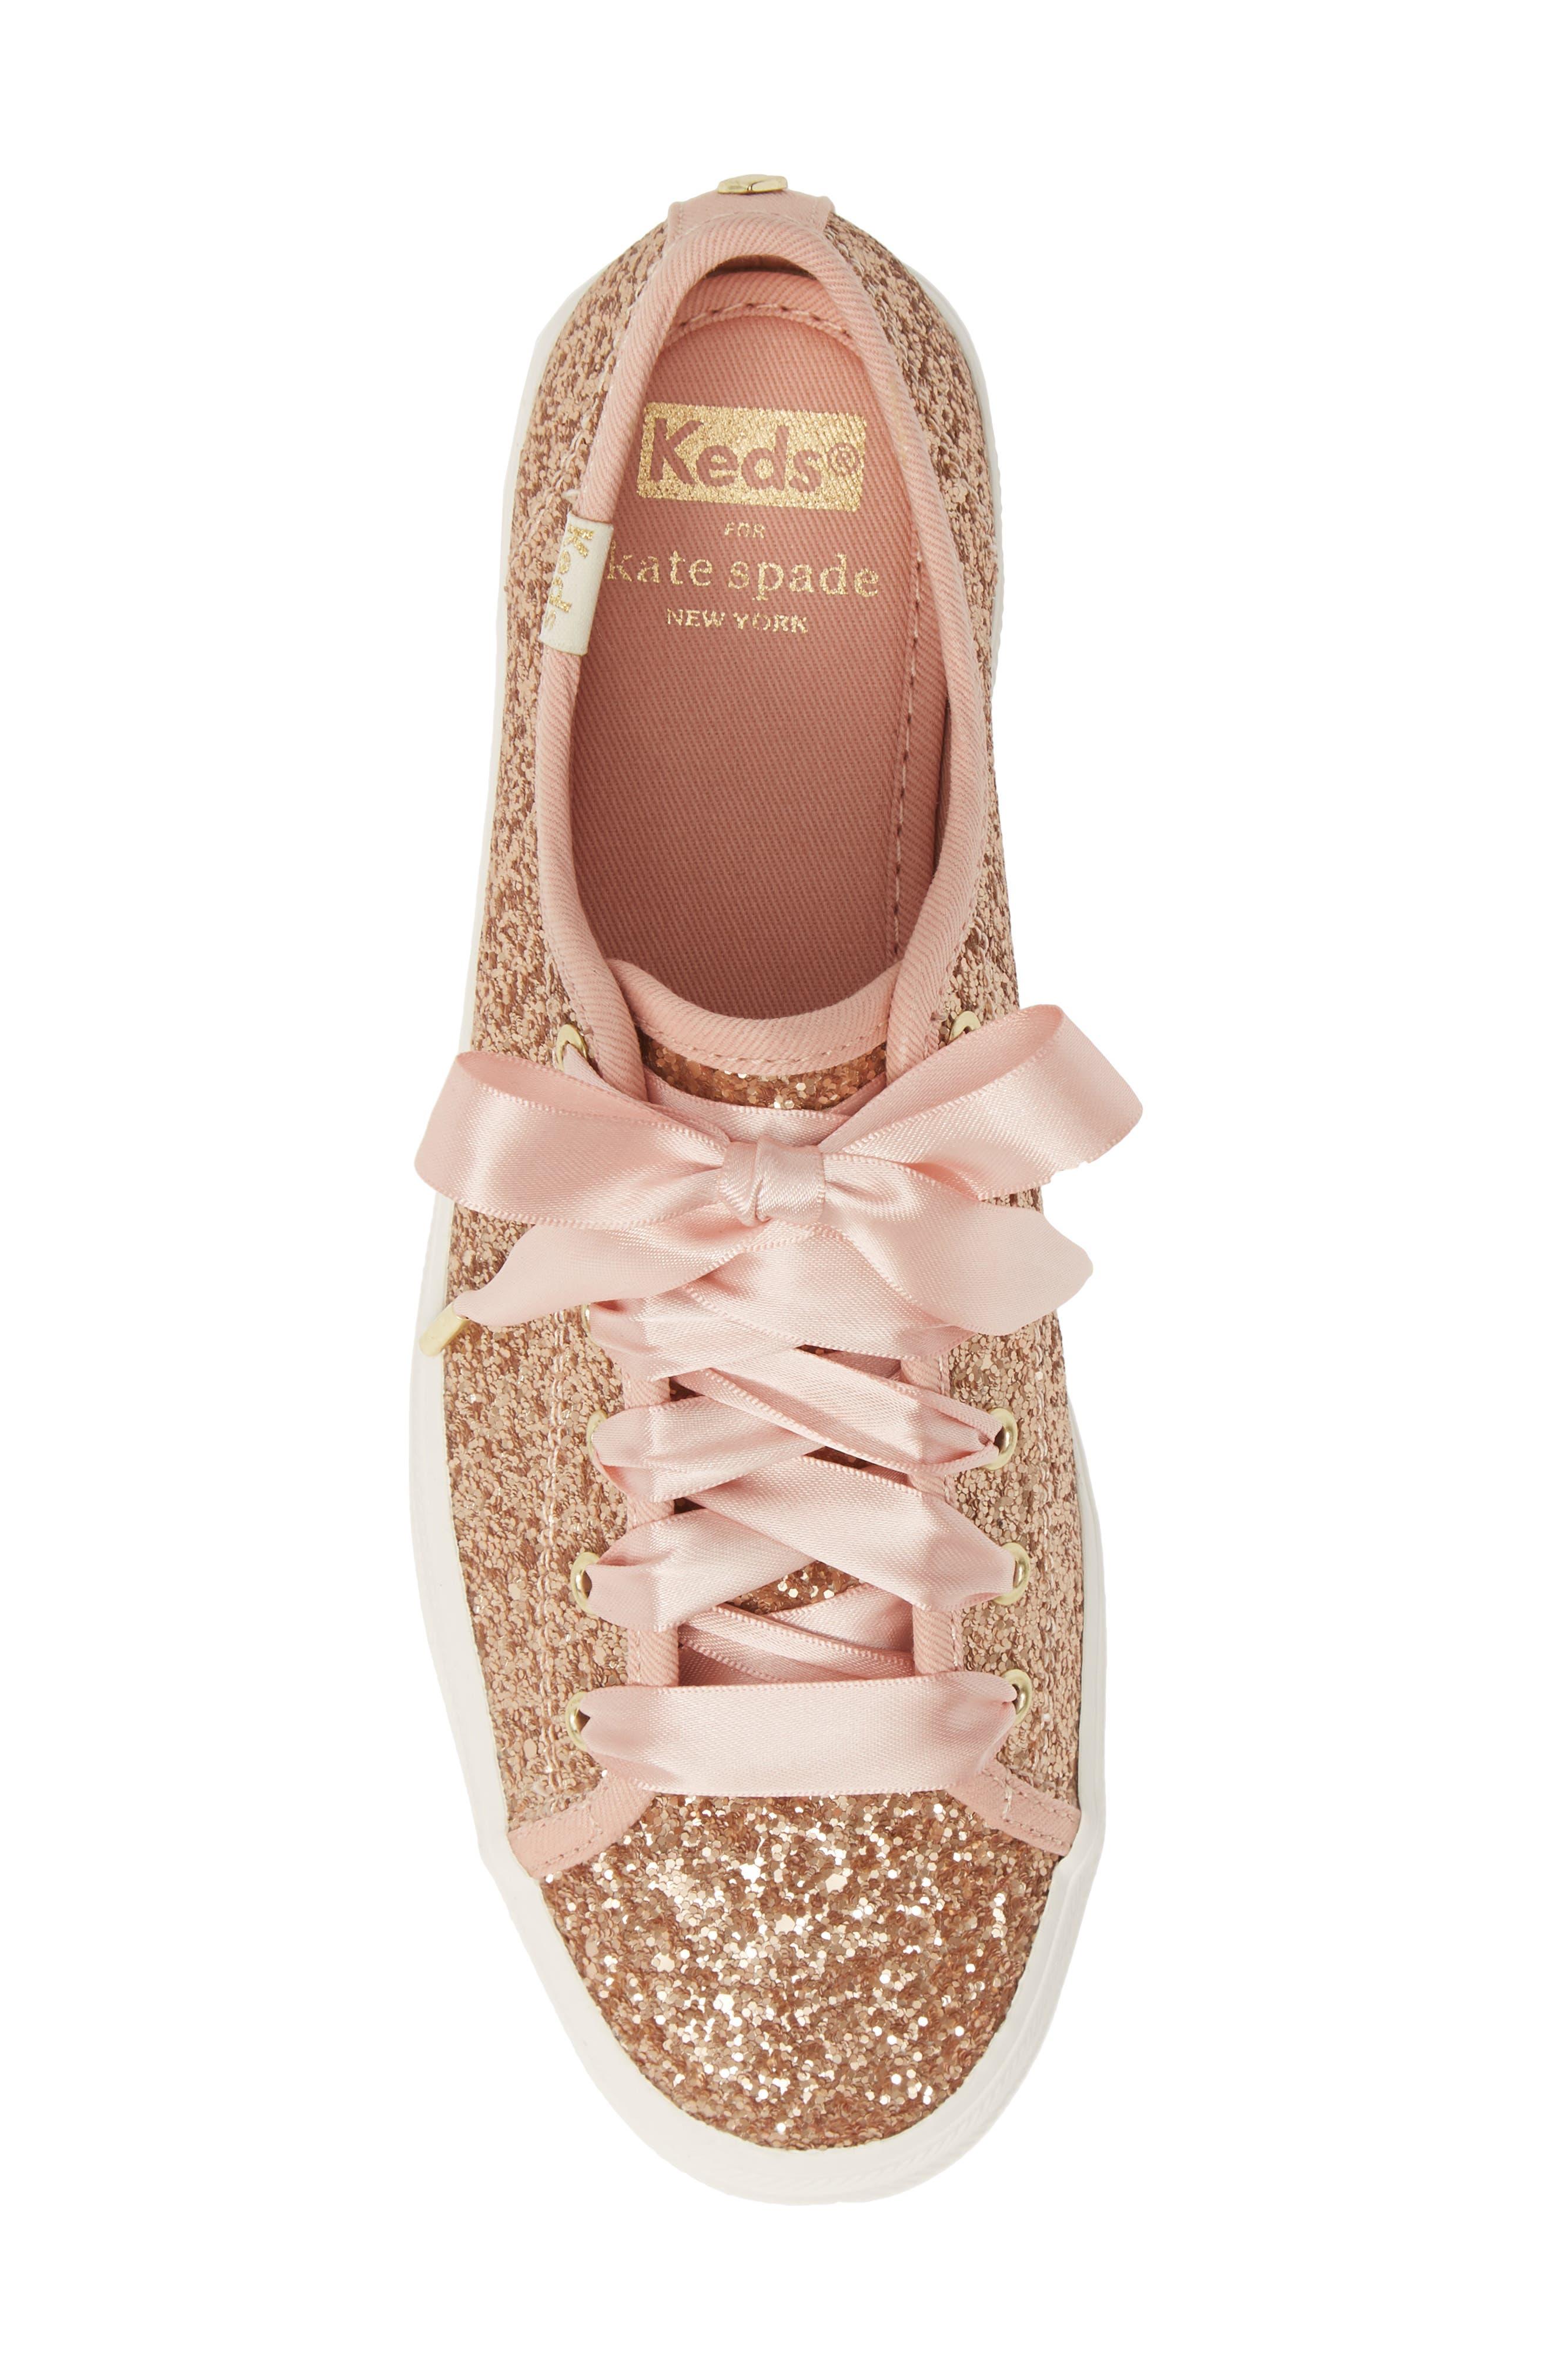 KEDS<SUP>®</SUP> FOR KATE SPADE NEW YORK, Keds<sup>®</sup> x kate spade new york Triple Kick Glitter Sneaker, Alternate thumbnail 5, color, ROSE GOLD